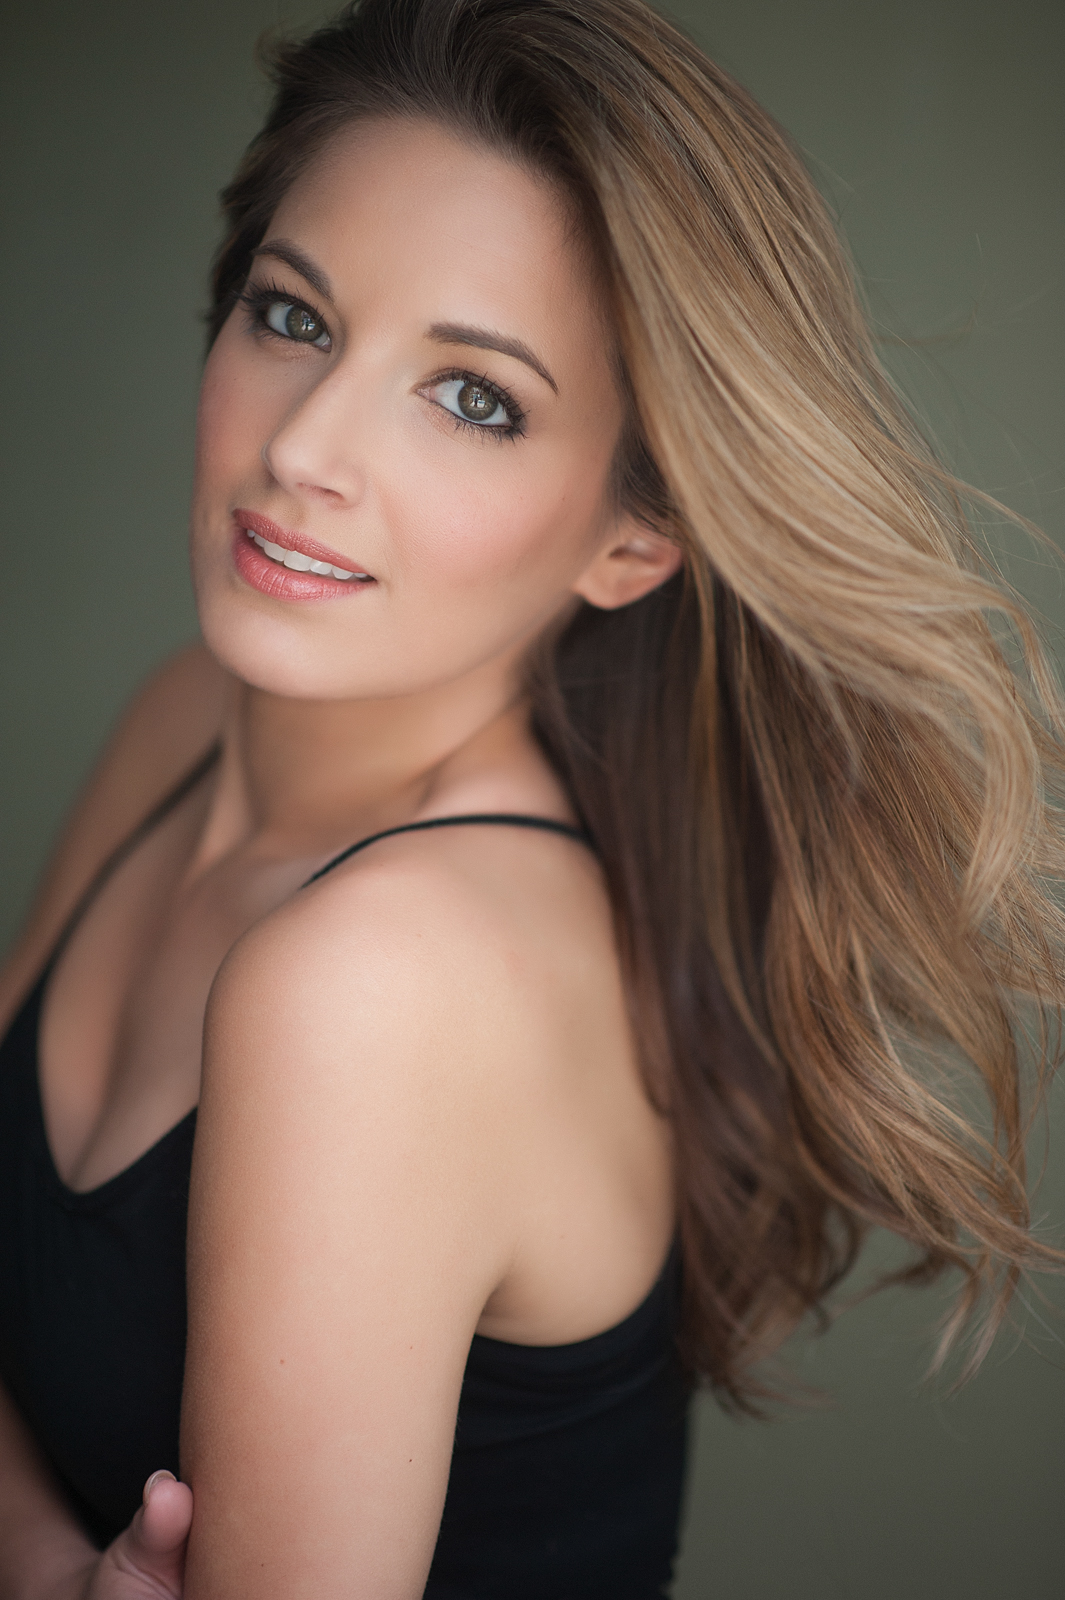 25-stunning-young-woman-headshot-makeup-wind-hair-captivating-eyes-megan-dipiero-photography-fort-myers-naples.jpg